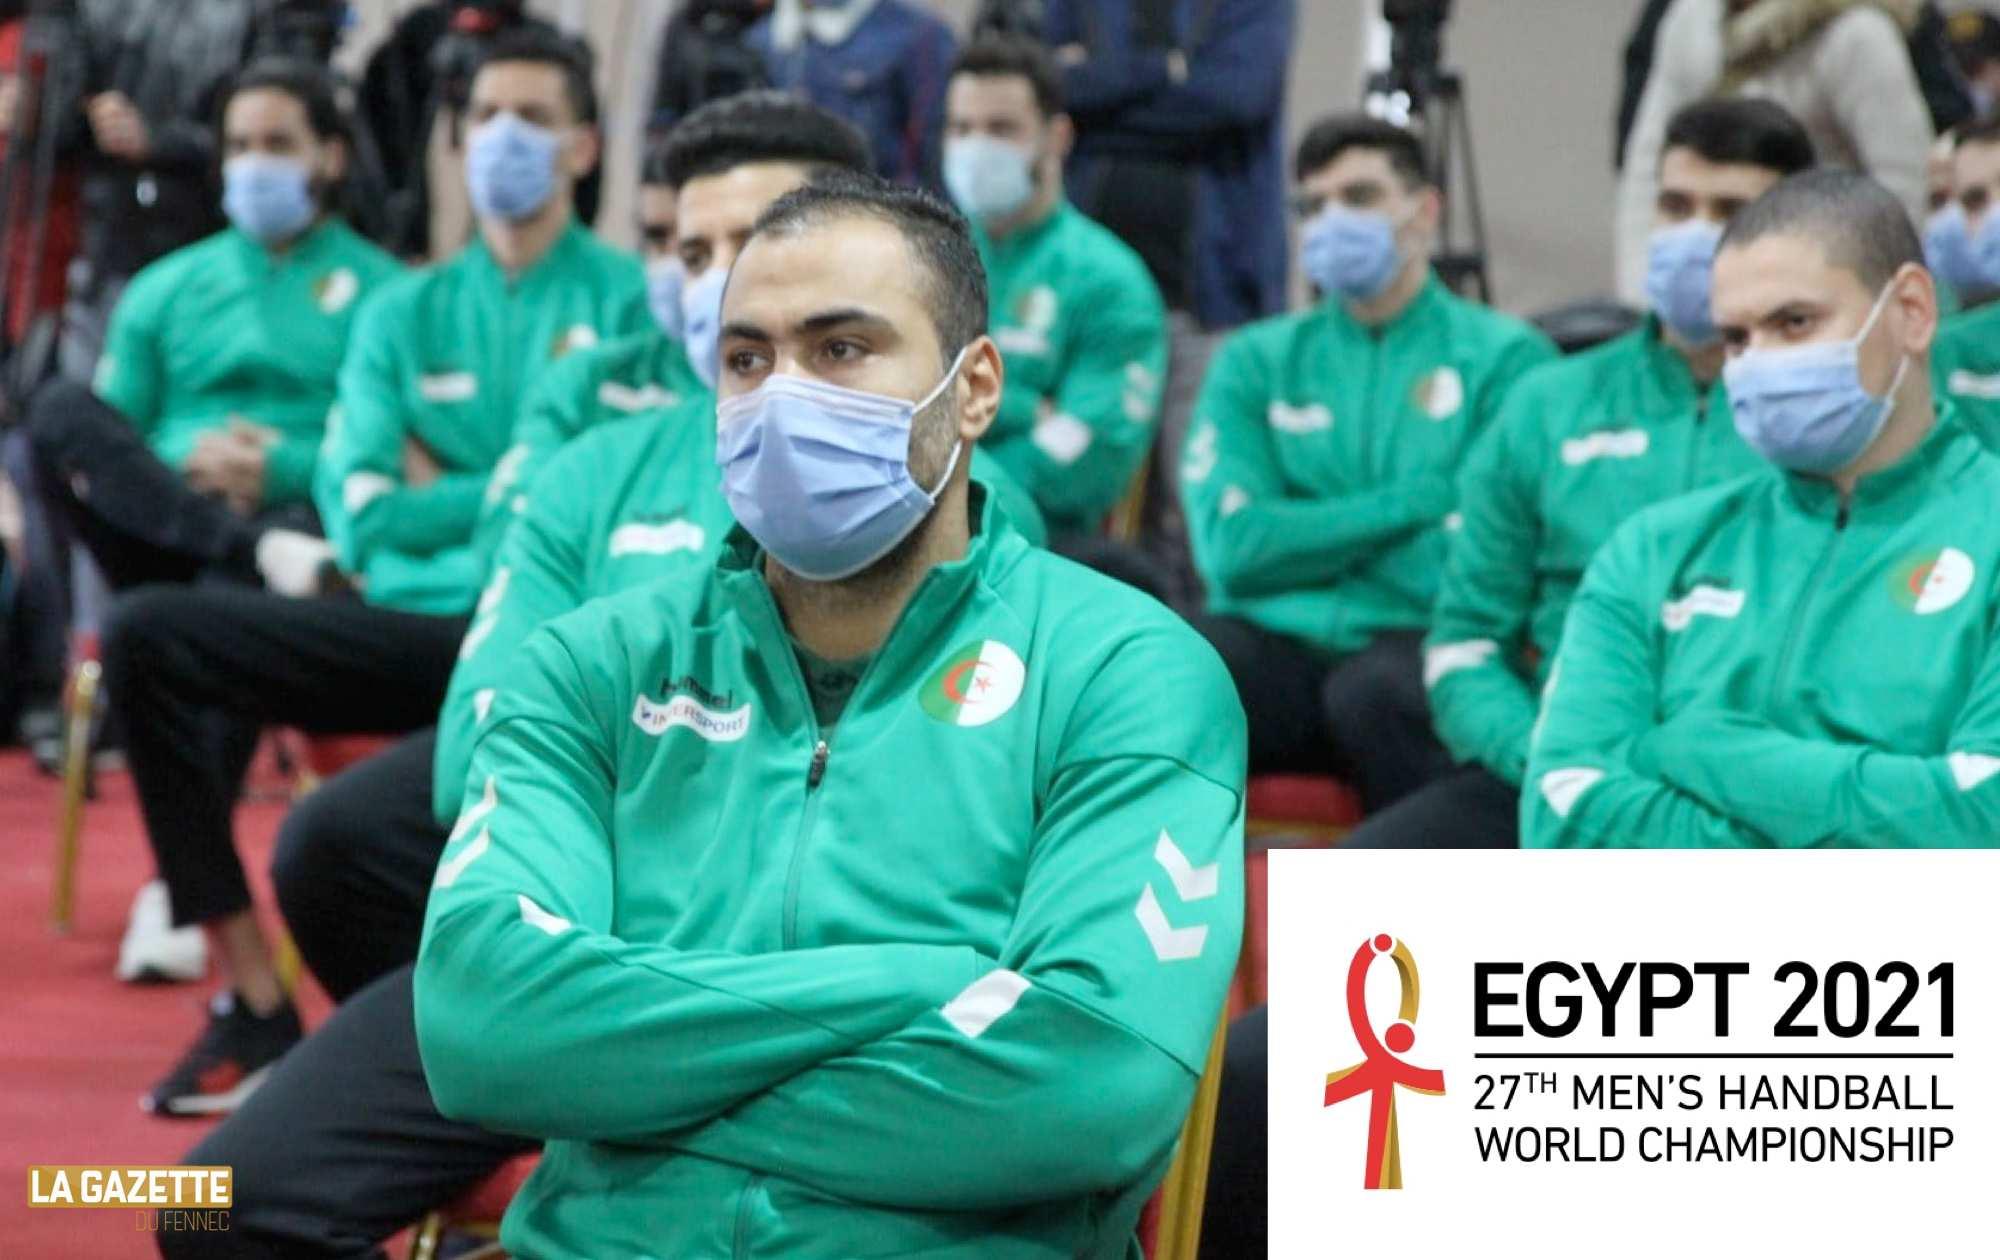 handball selection egypt 2021